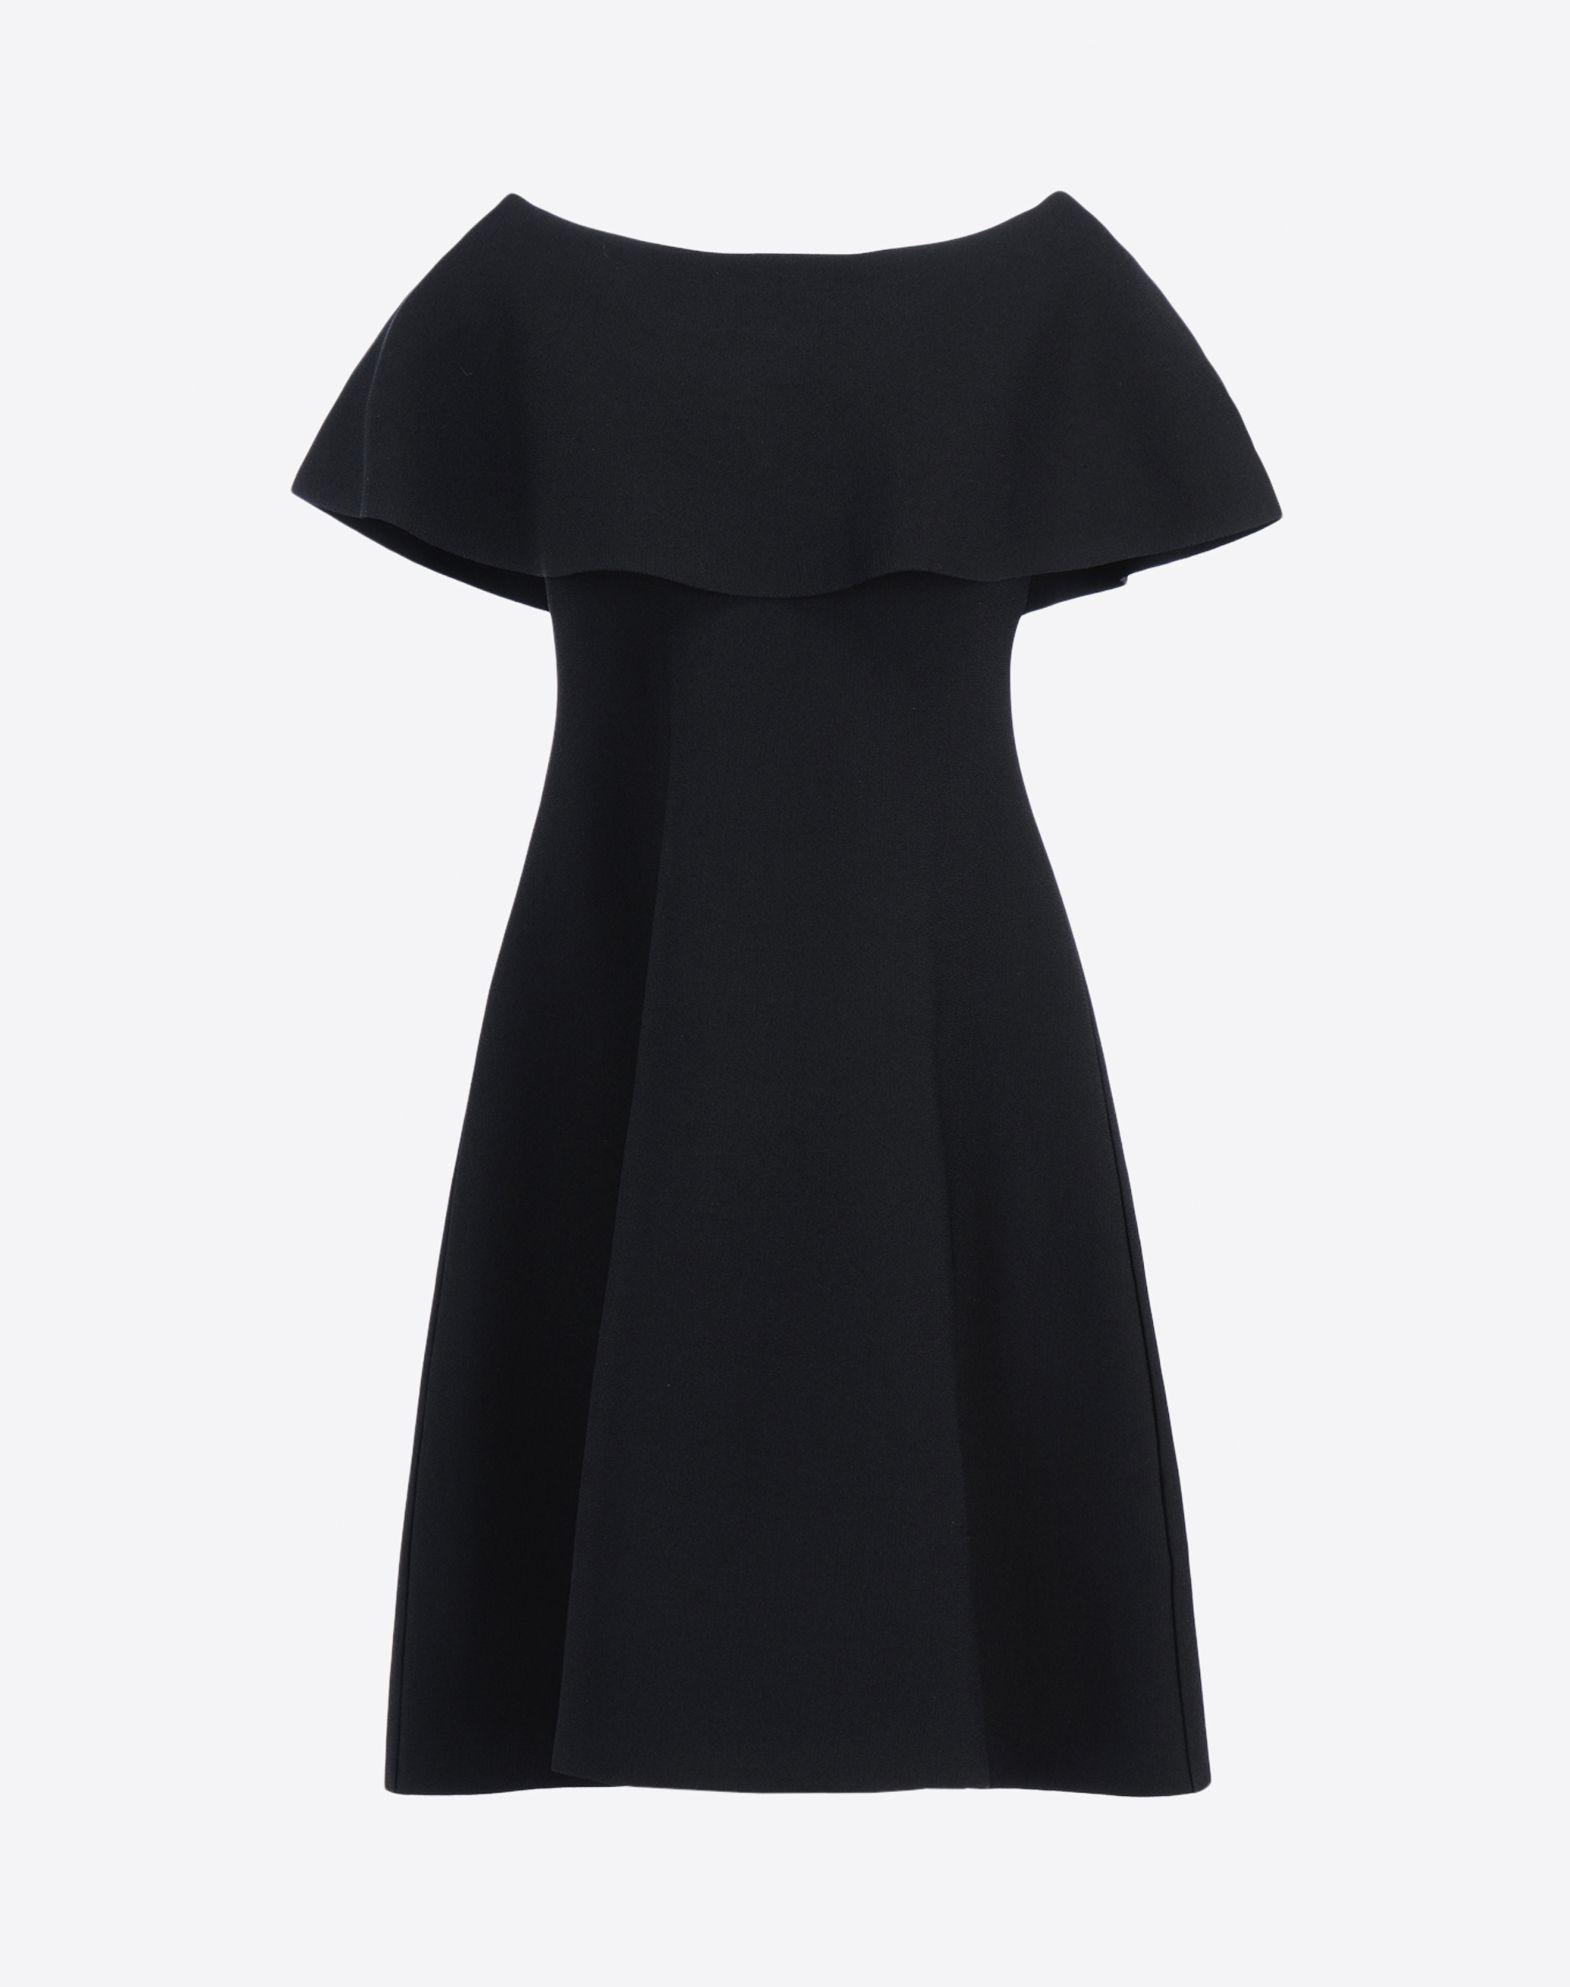 VALENTINO Knitted Wide neckline Unlined Raw-cut hem  34600260ol